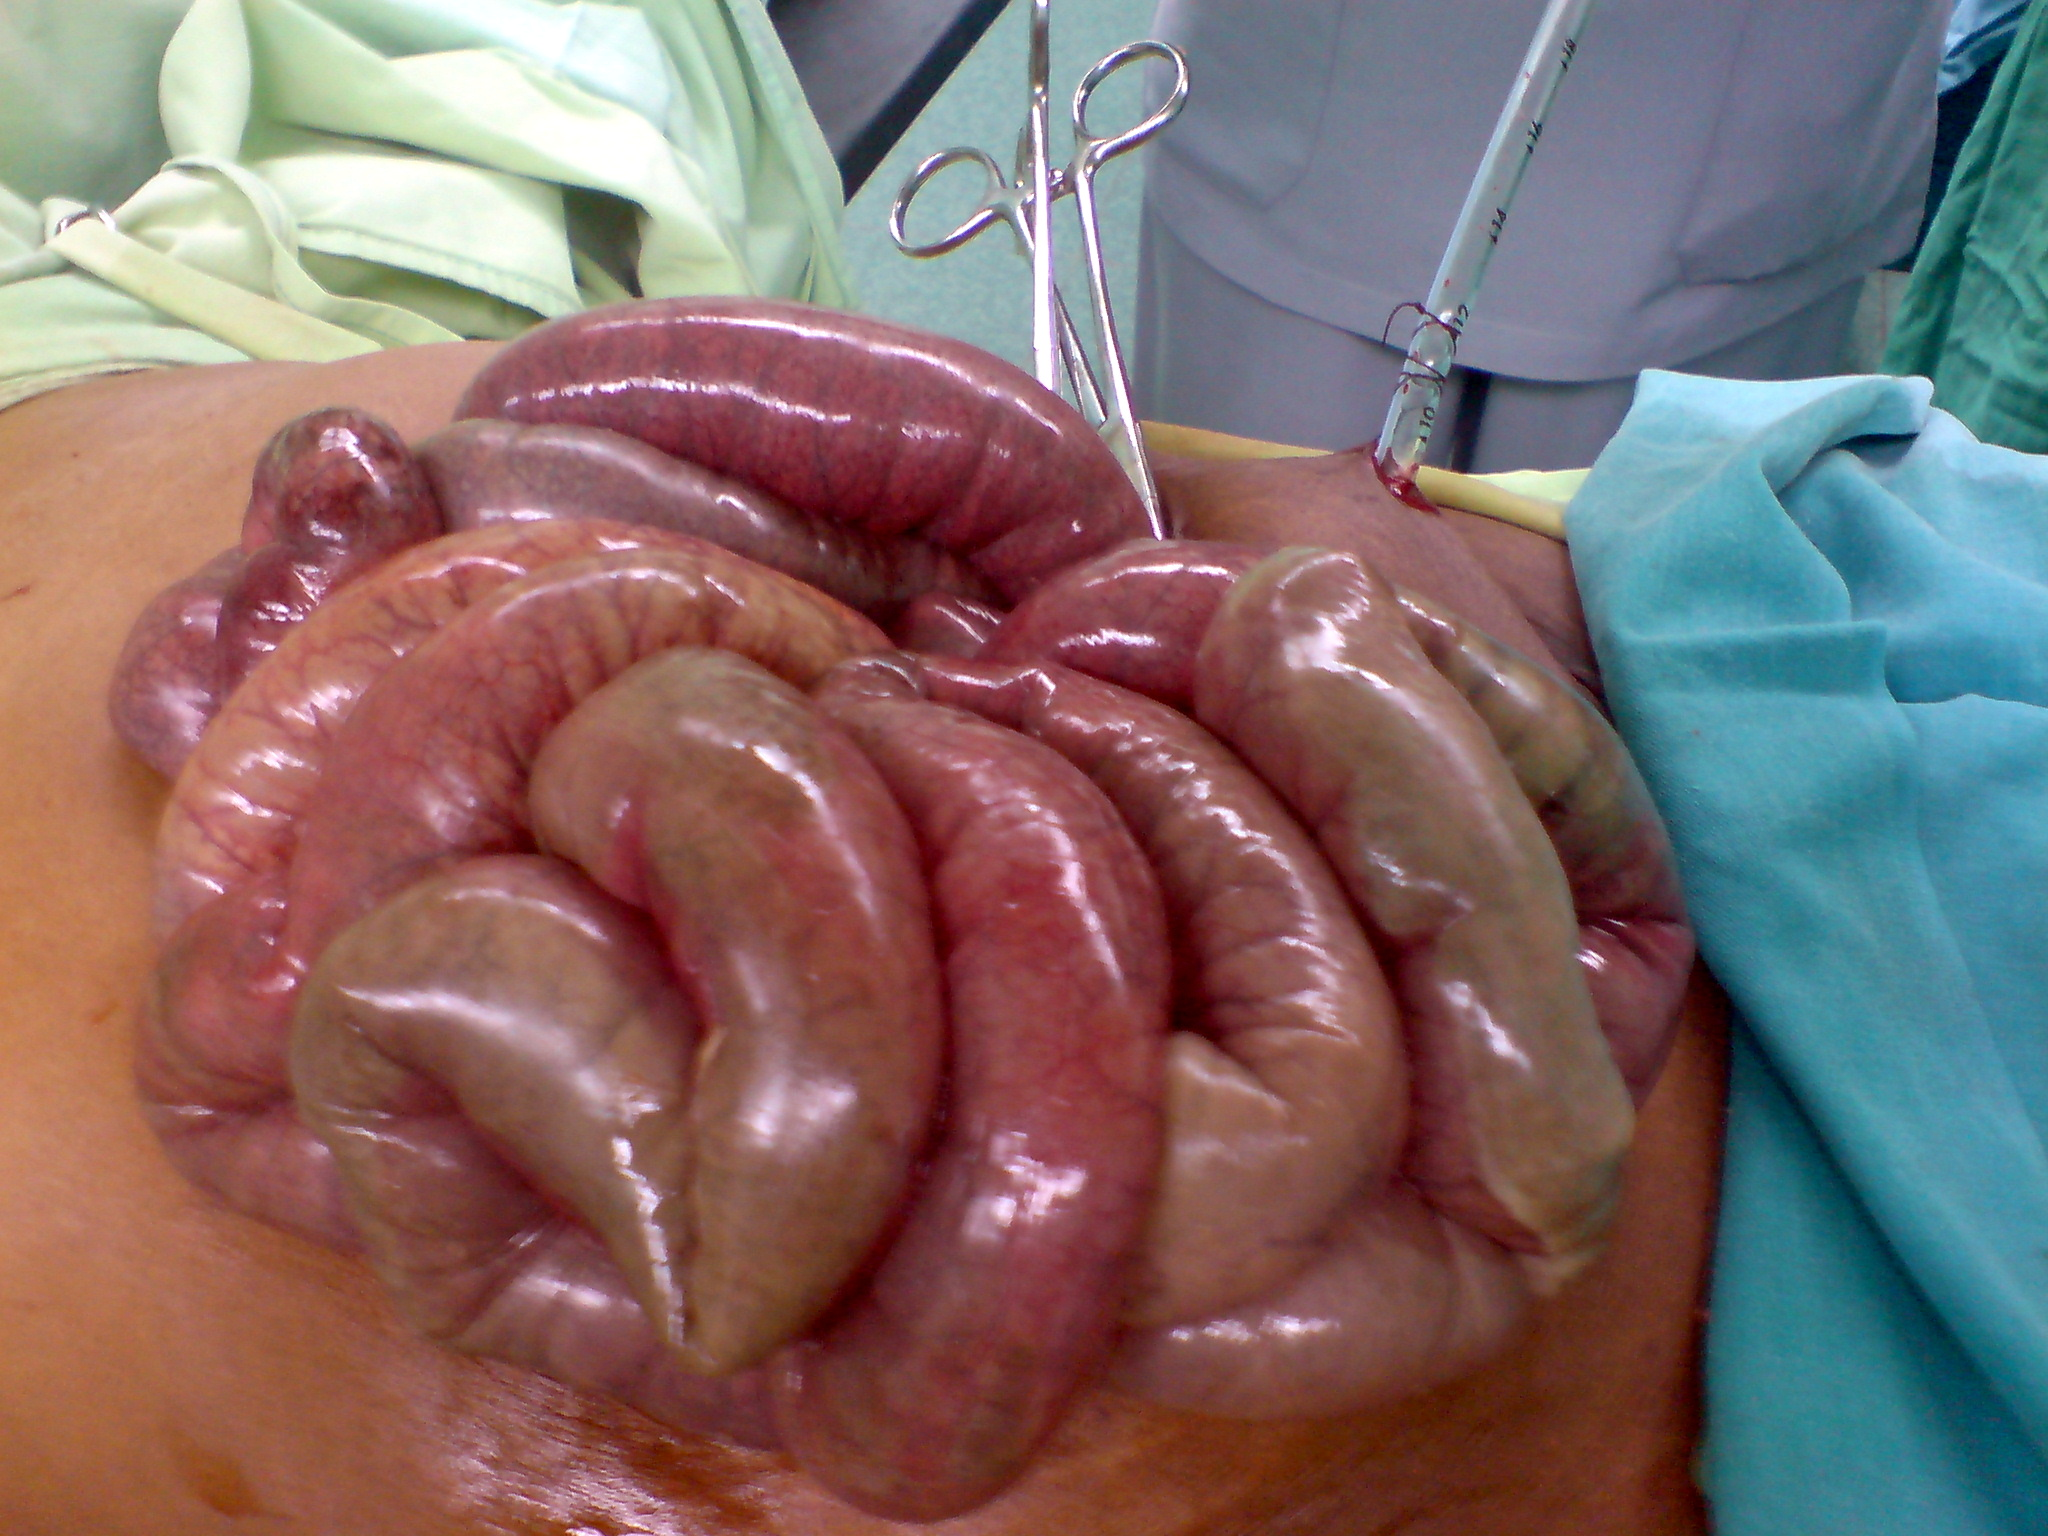 pathology outlines - infarct